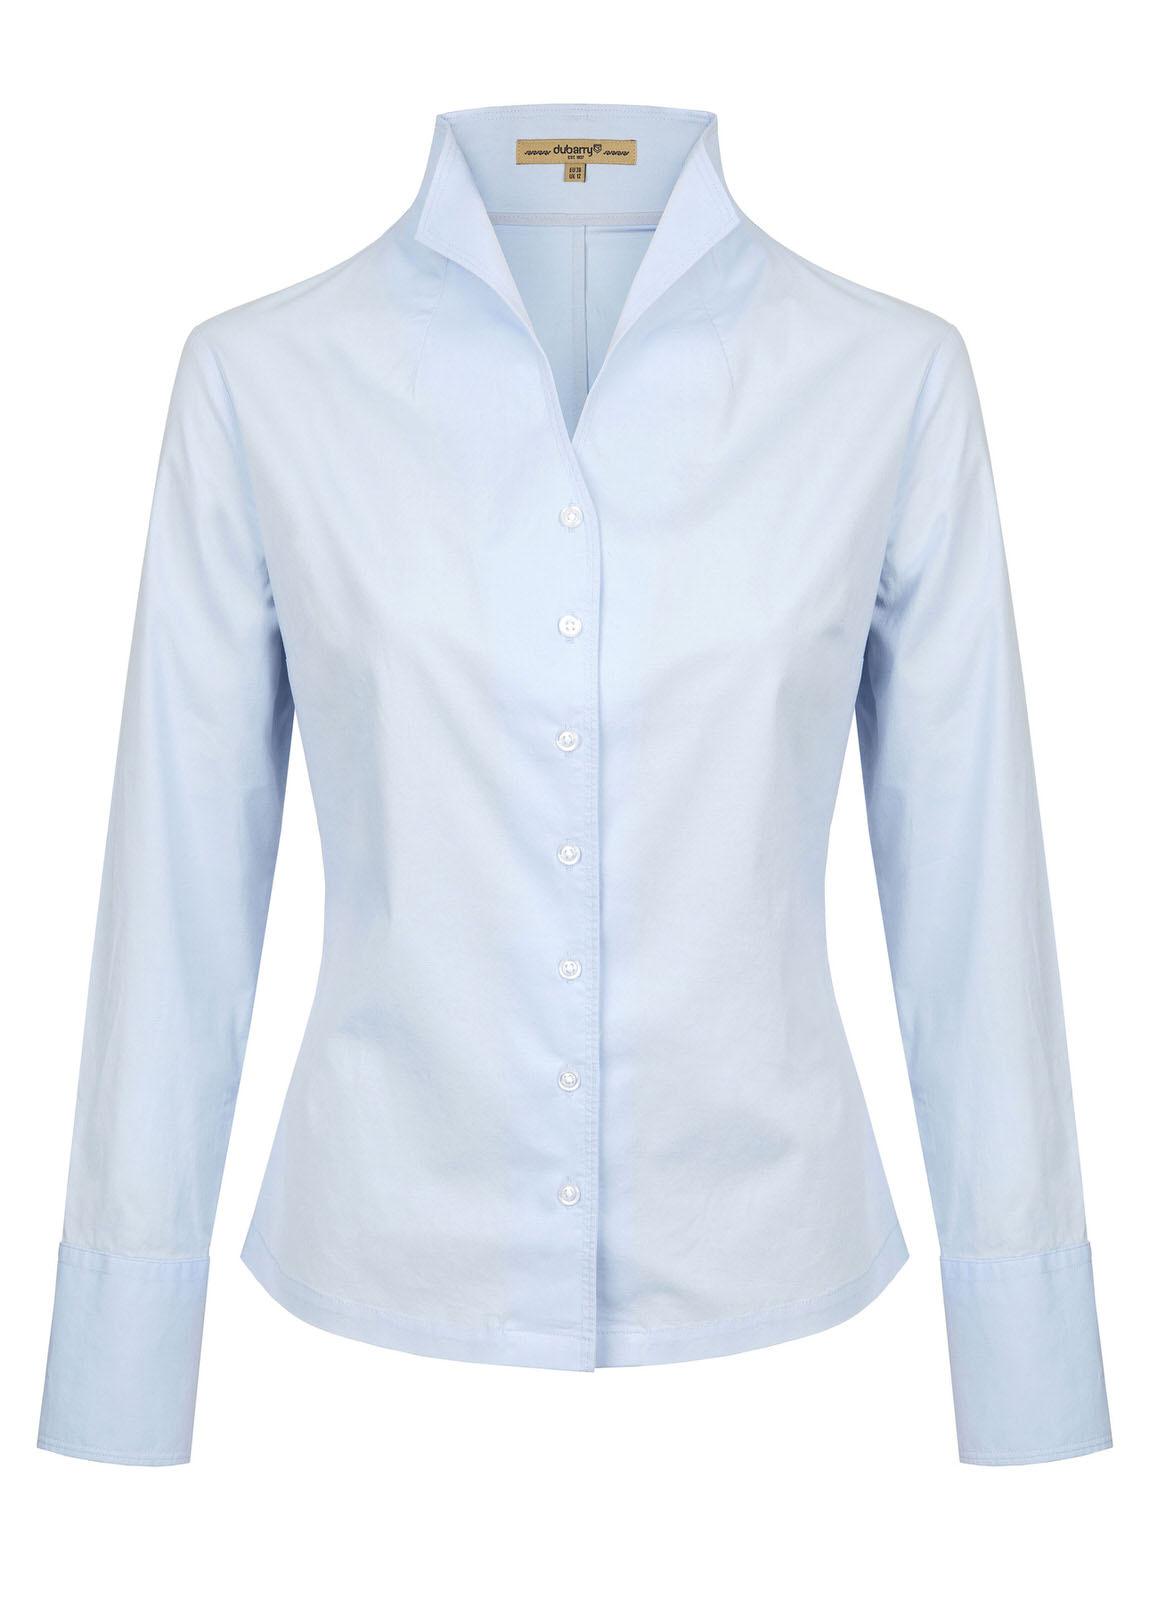 Snowdrop_Shirt_Pale_Blue_Image_1